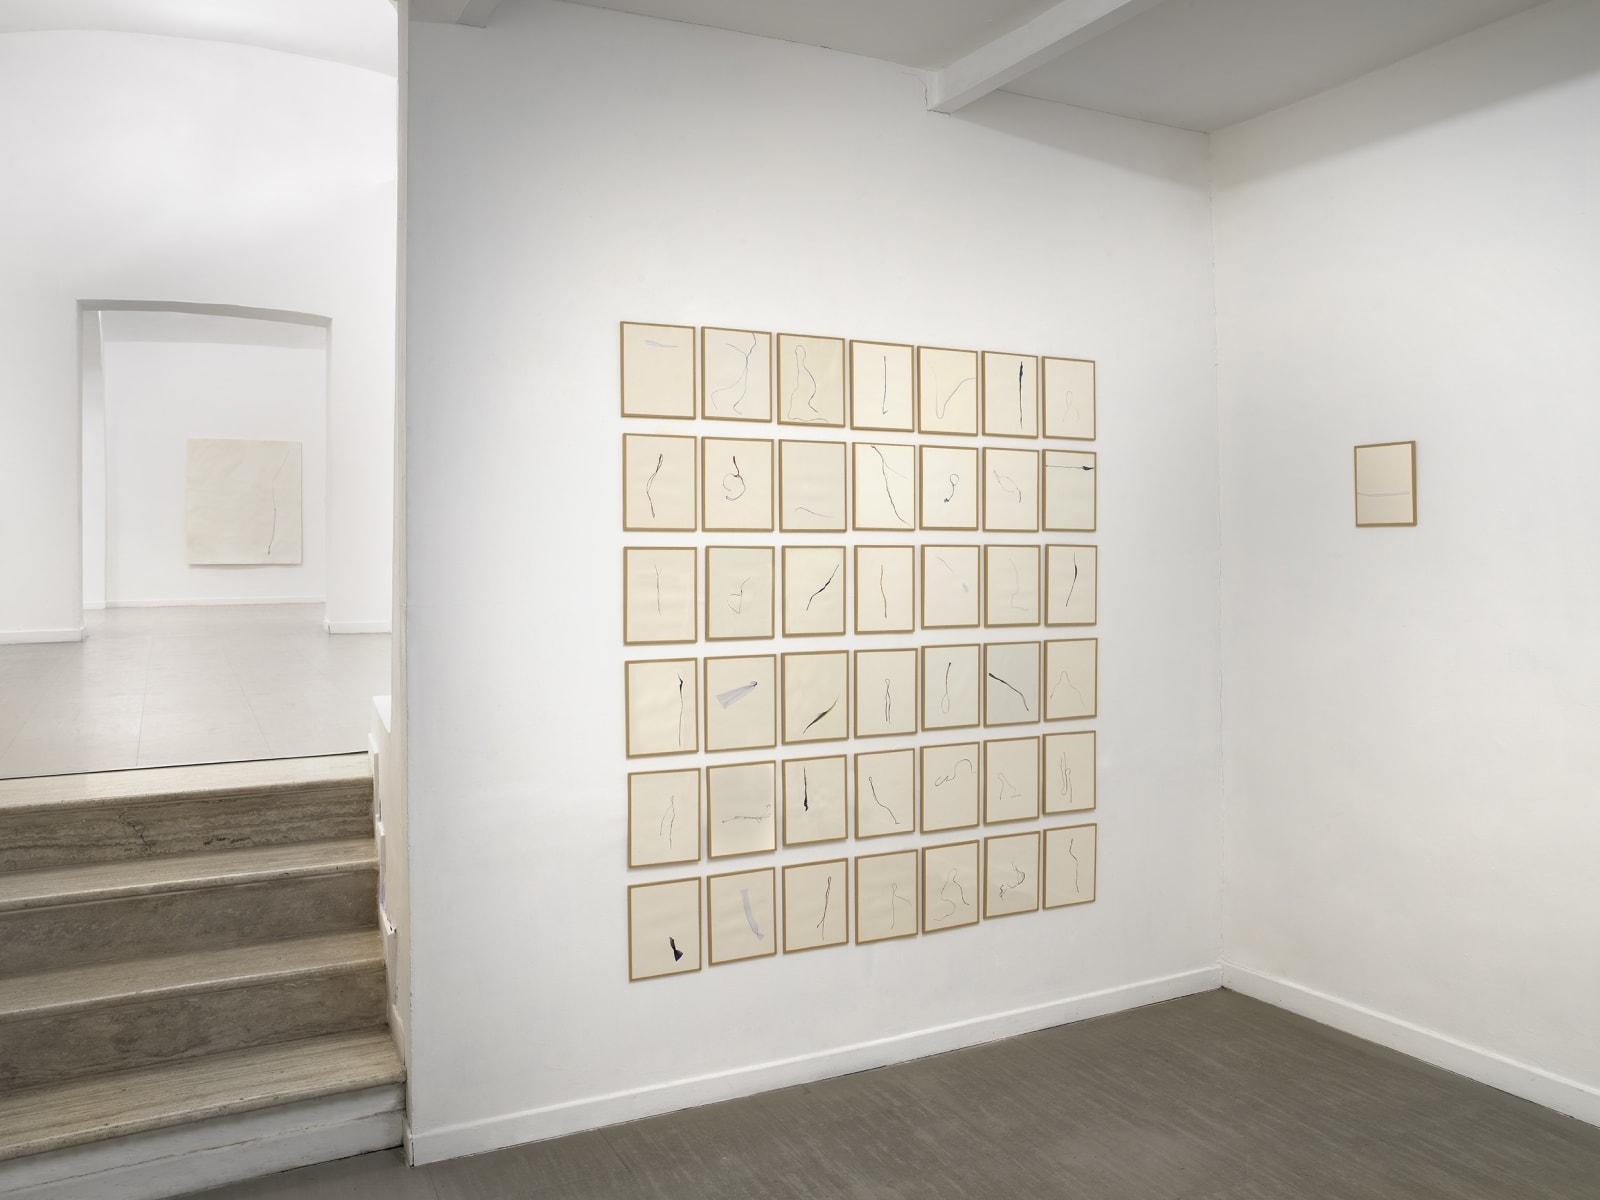 Beatrice Pediconi Nude curated by Cecilia Canziani installation view of the first room ph. Dario Lasagni